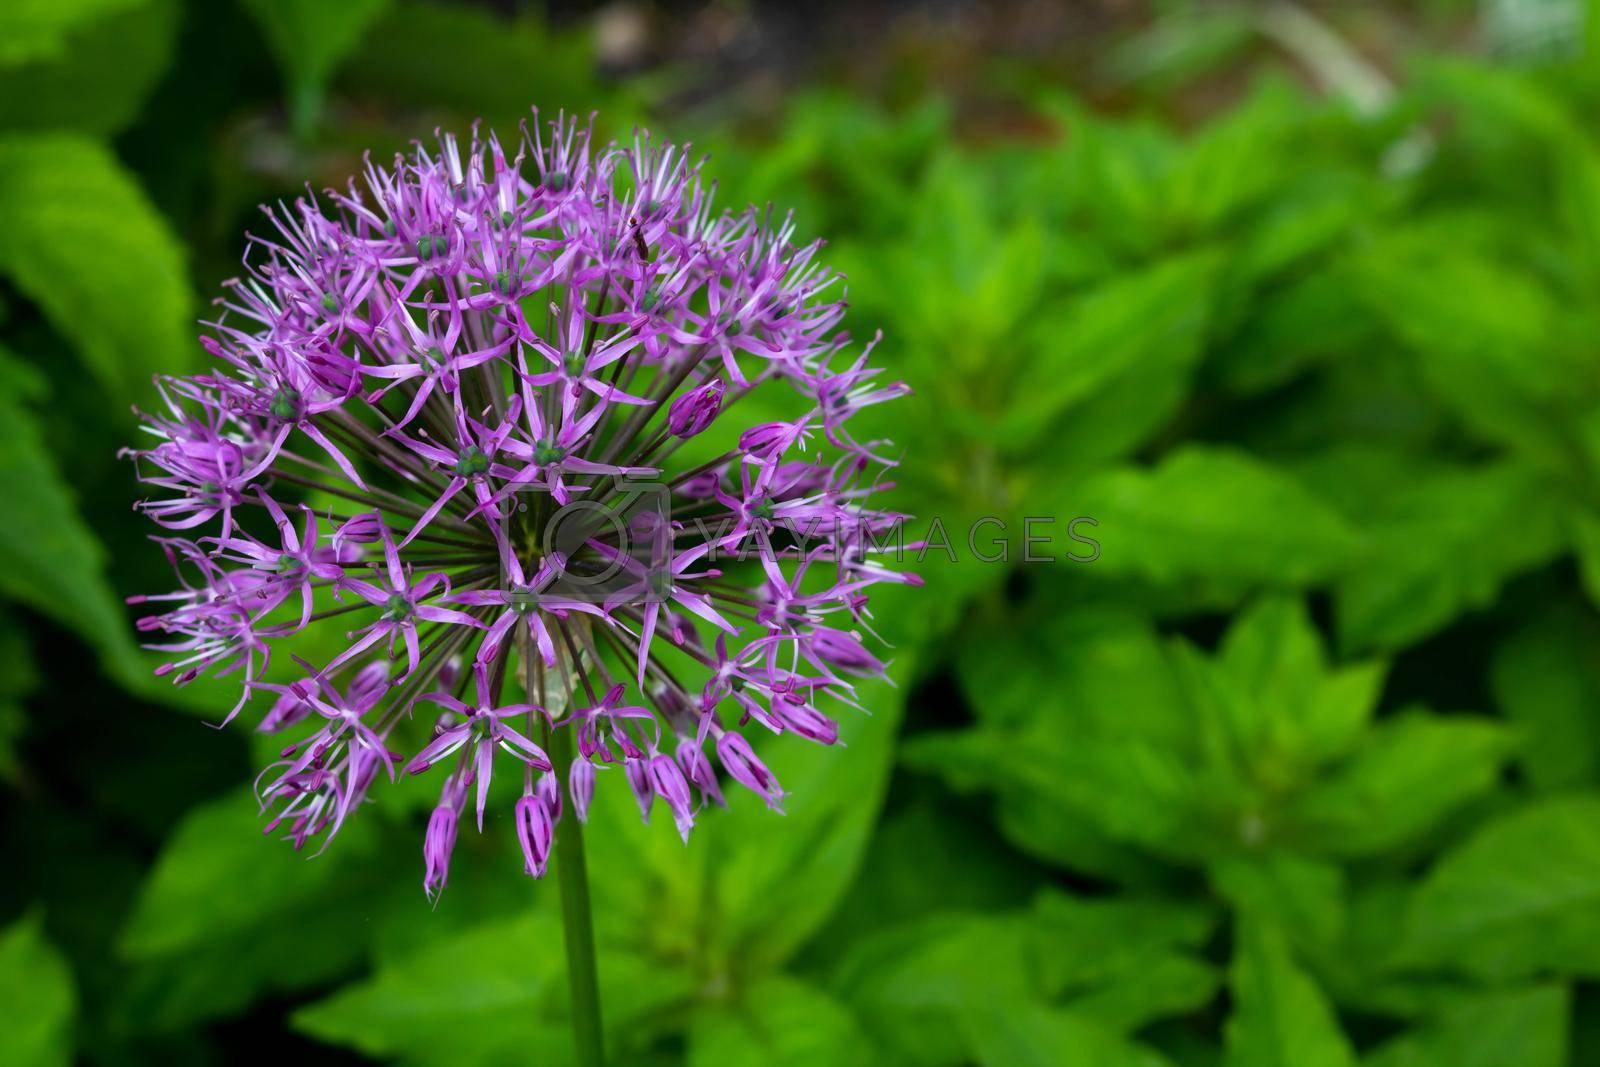 Allium sort Mercurius: decorative onion blooms in the flower garden in early summer.